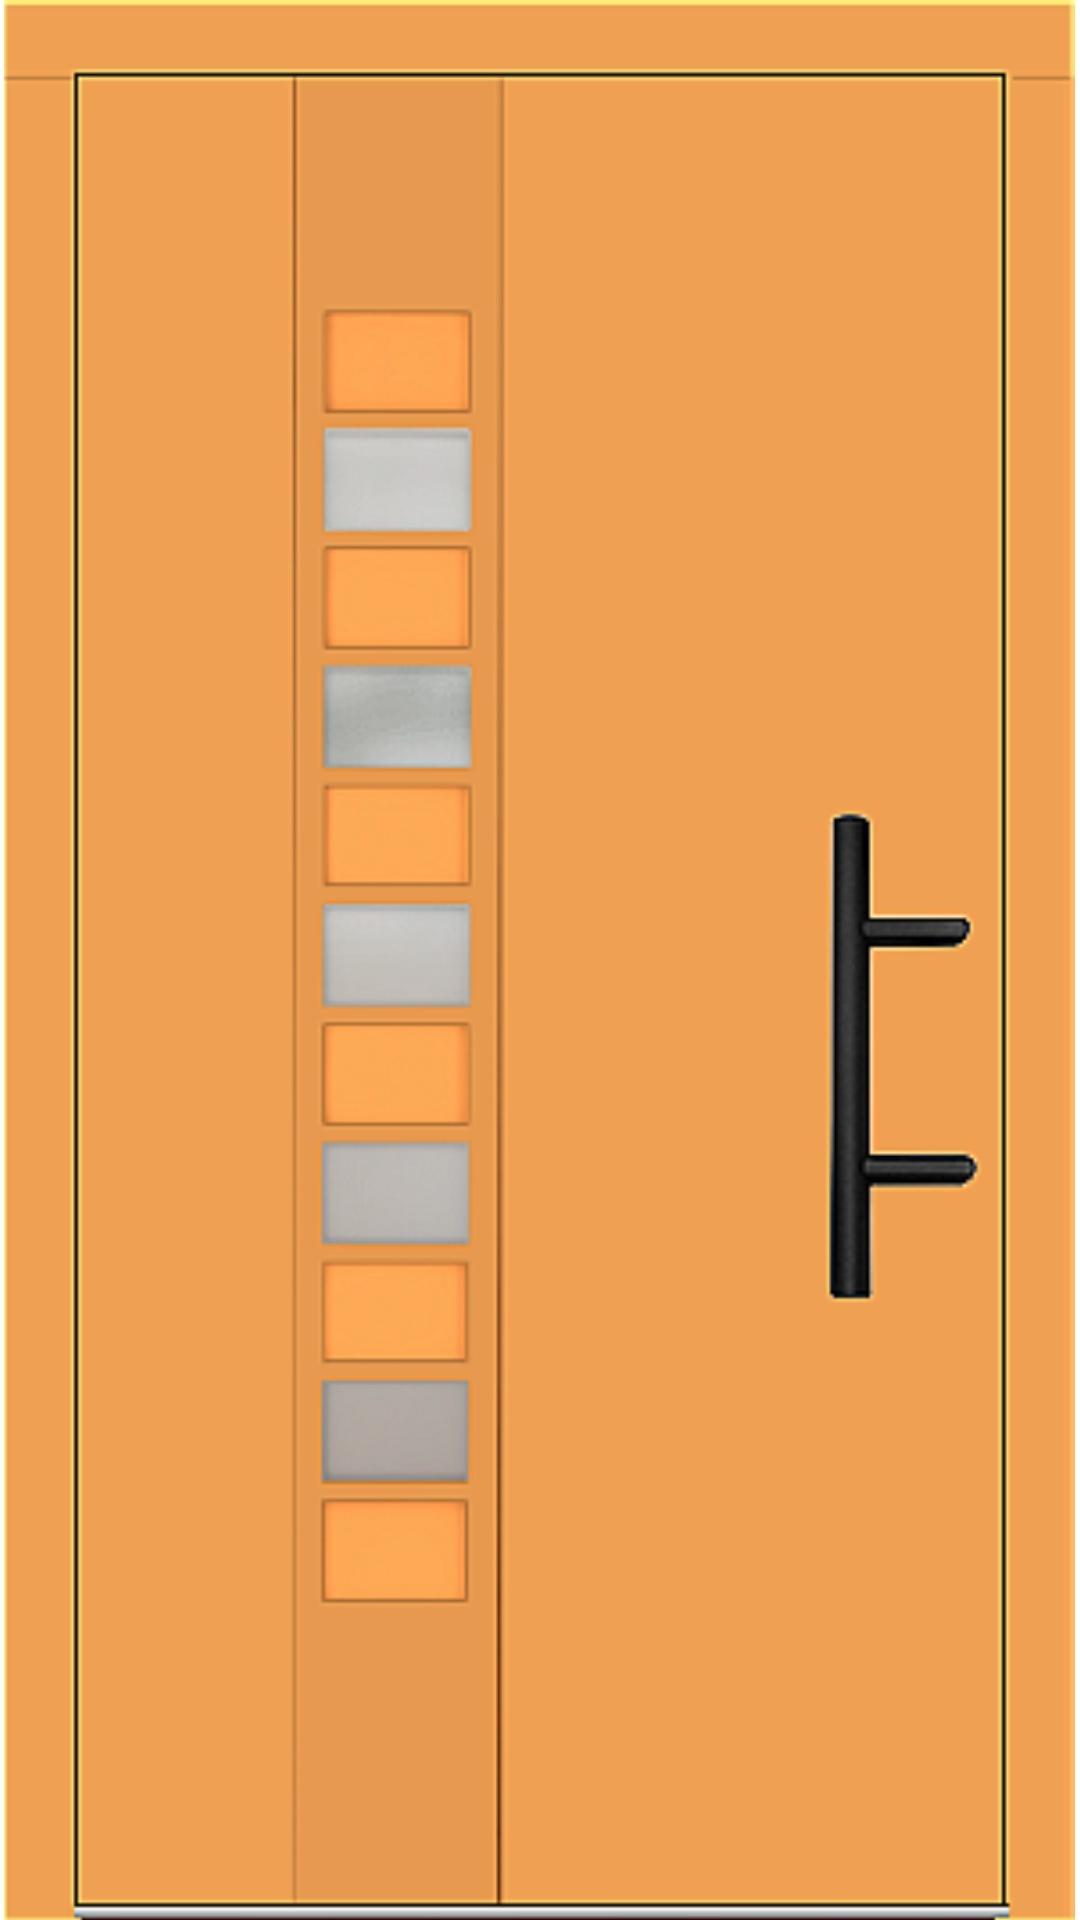 Holz Haustür Modell 70250 safrangelb